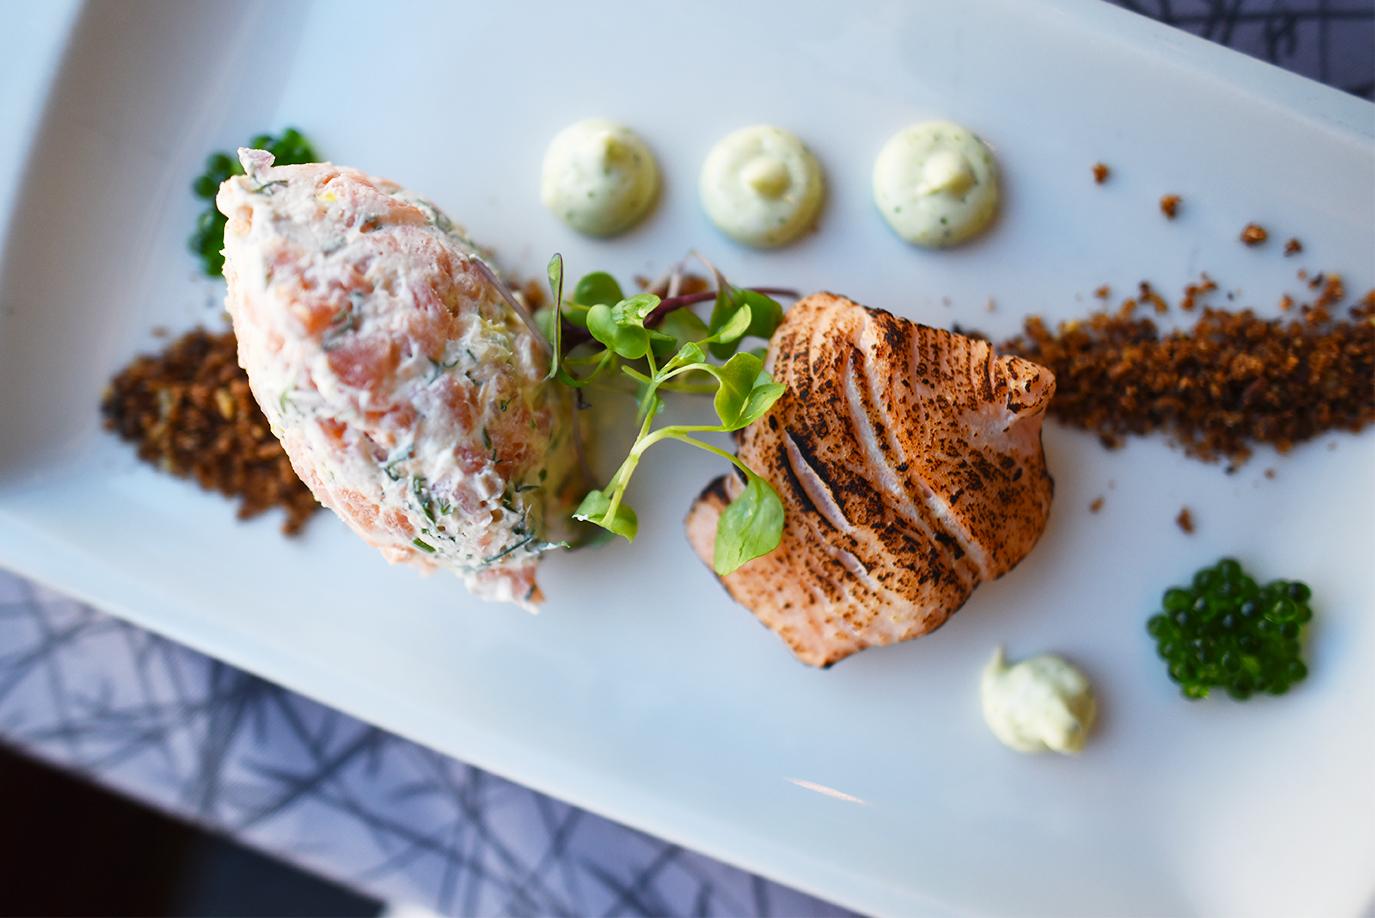 ravintola-kaarna-sok-helsinki-sundayblondie-9.jpg